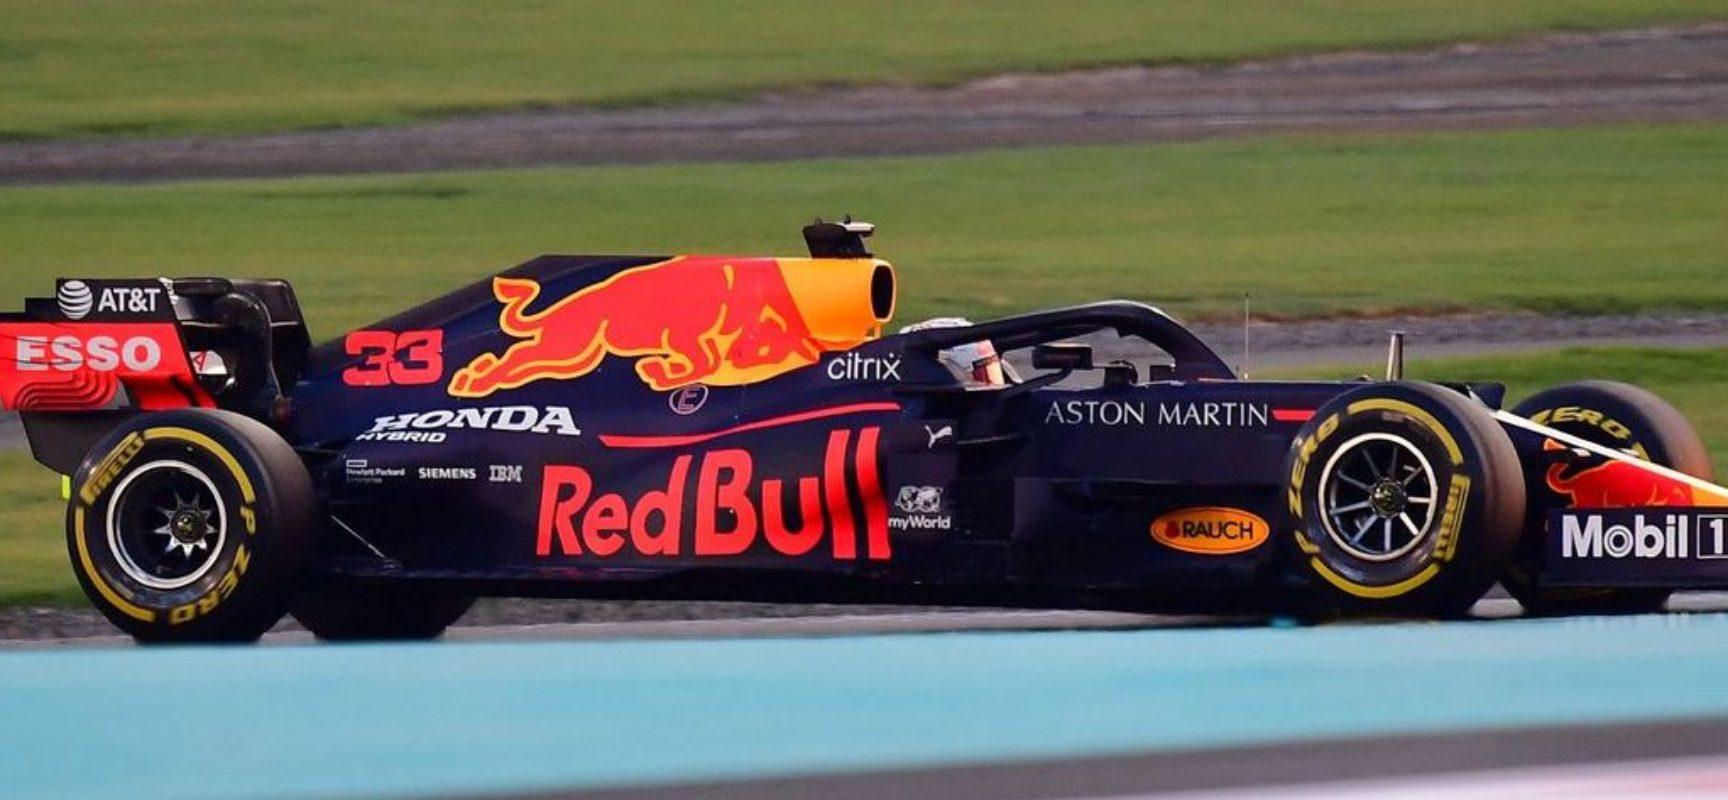 Red Bull apresenta carro de F1 com expectativa de derrotar Mercedes